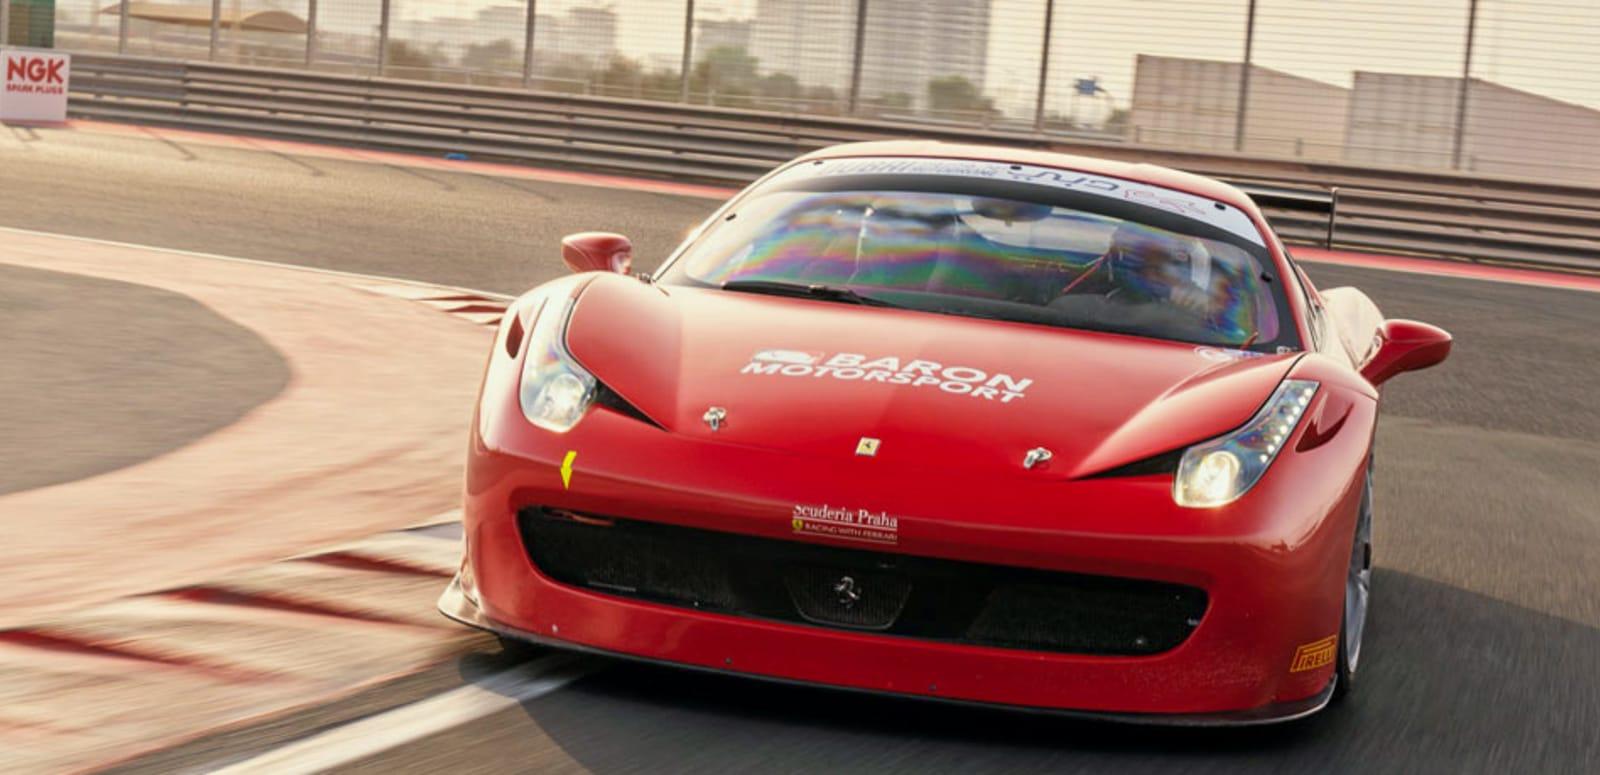 Ferrari Gt Driving Experience In Dubai Flat 13 Off